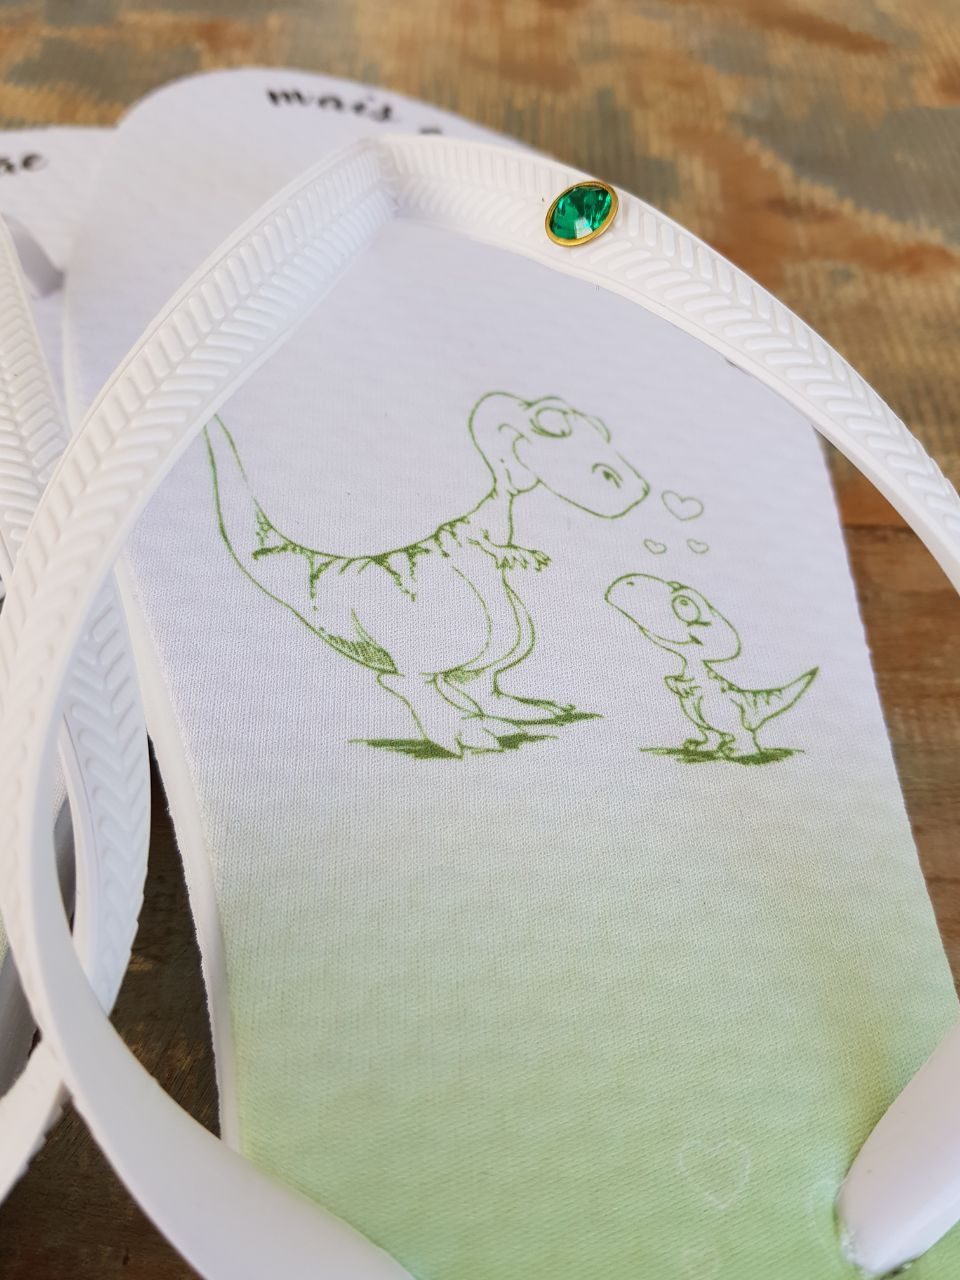 Mãe Dinossauro